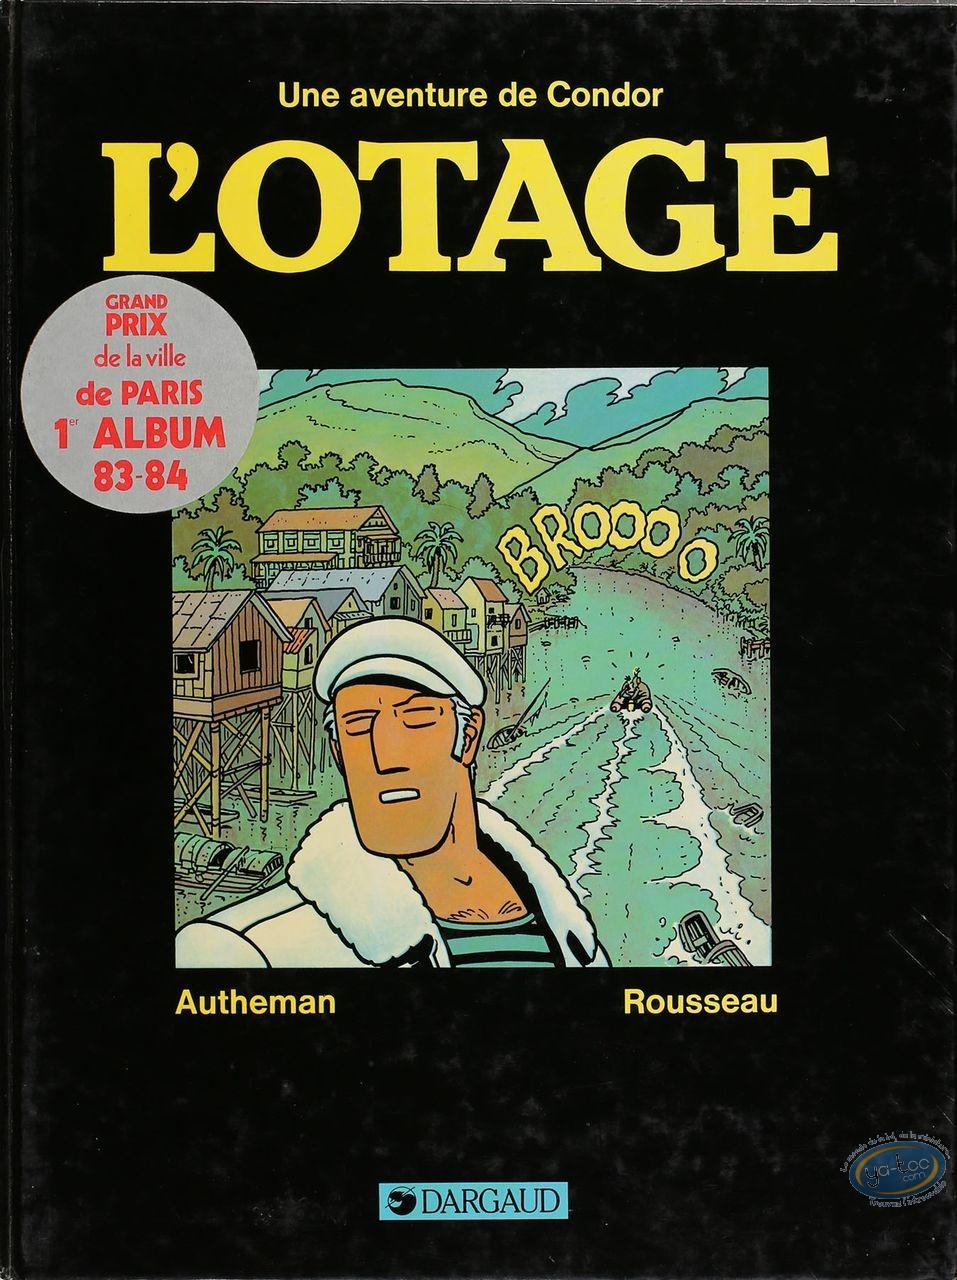 Listed European Comic Books, Condor : L'Otage (good condition)